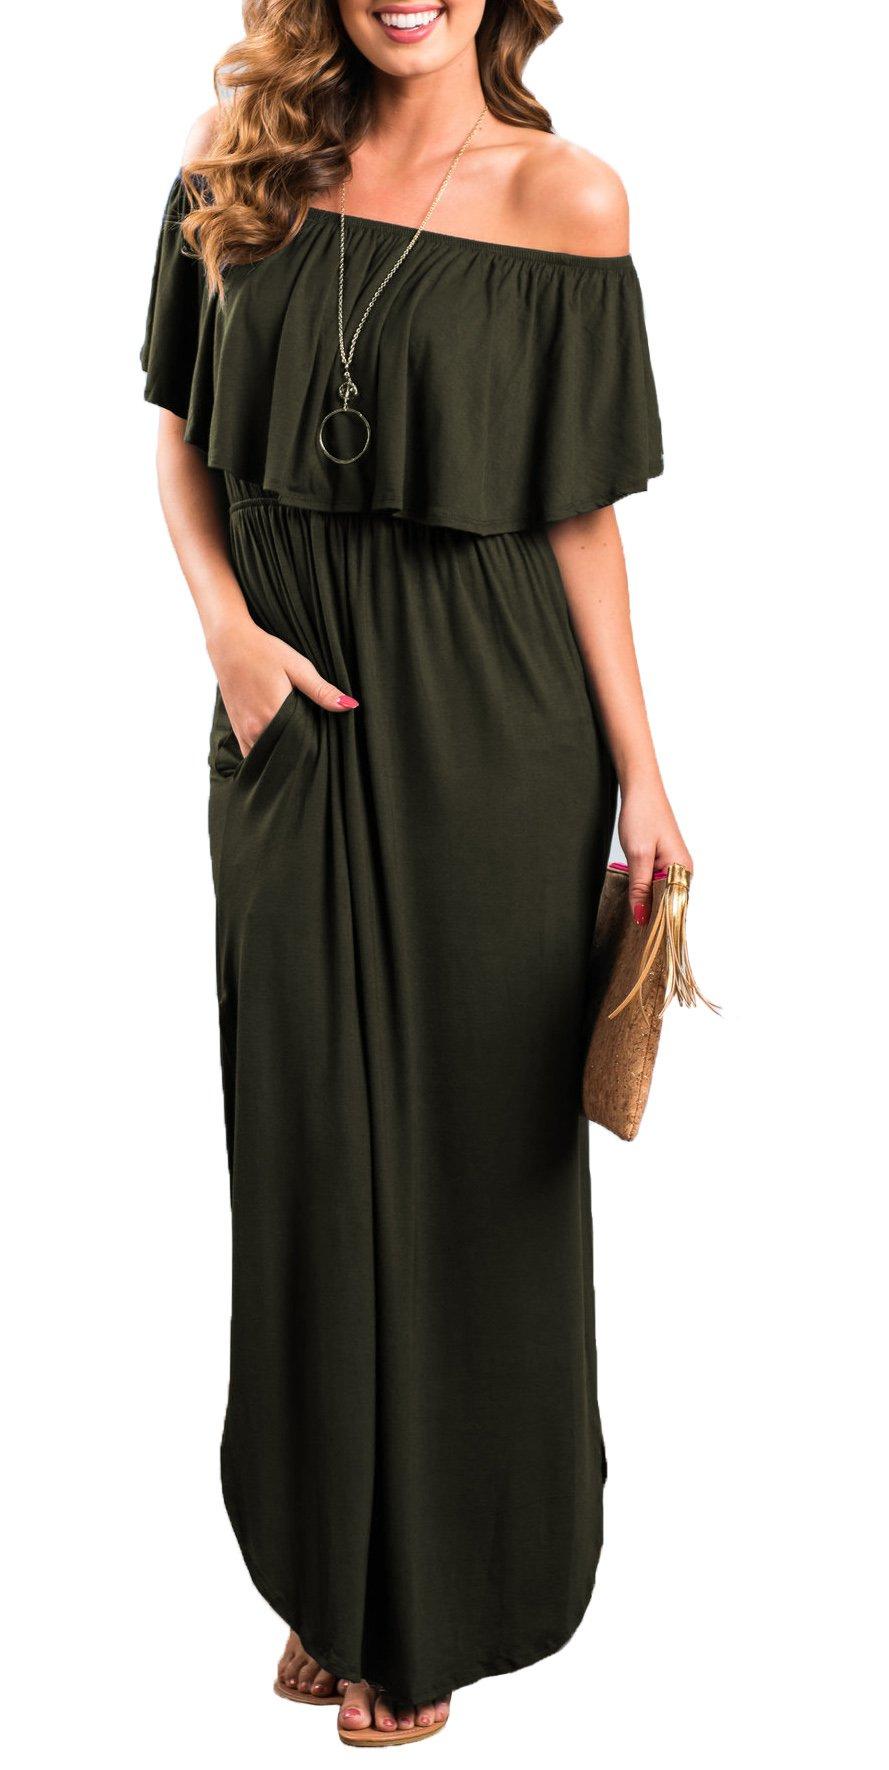 Womens Off The Shoulder Ruffle Party Dresses Side Split Beach Maxi Dress Olive L